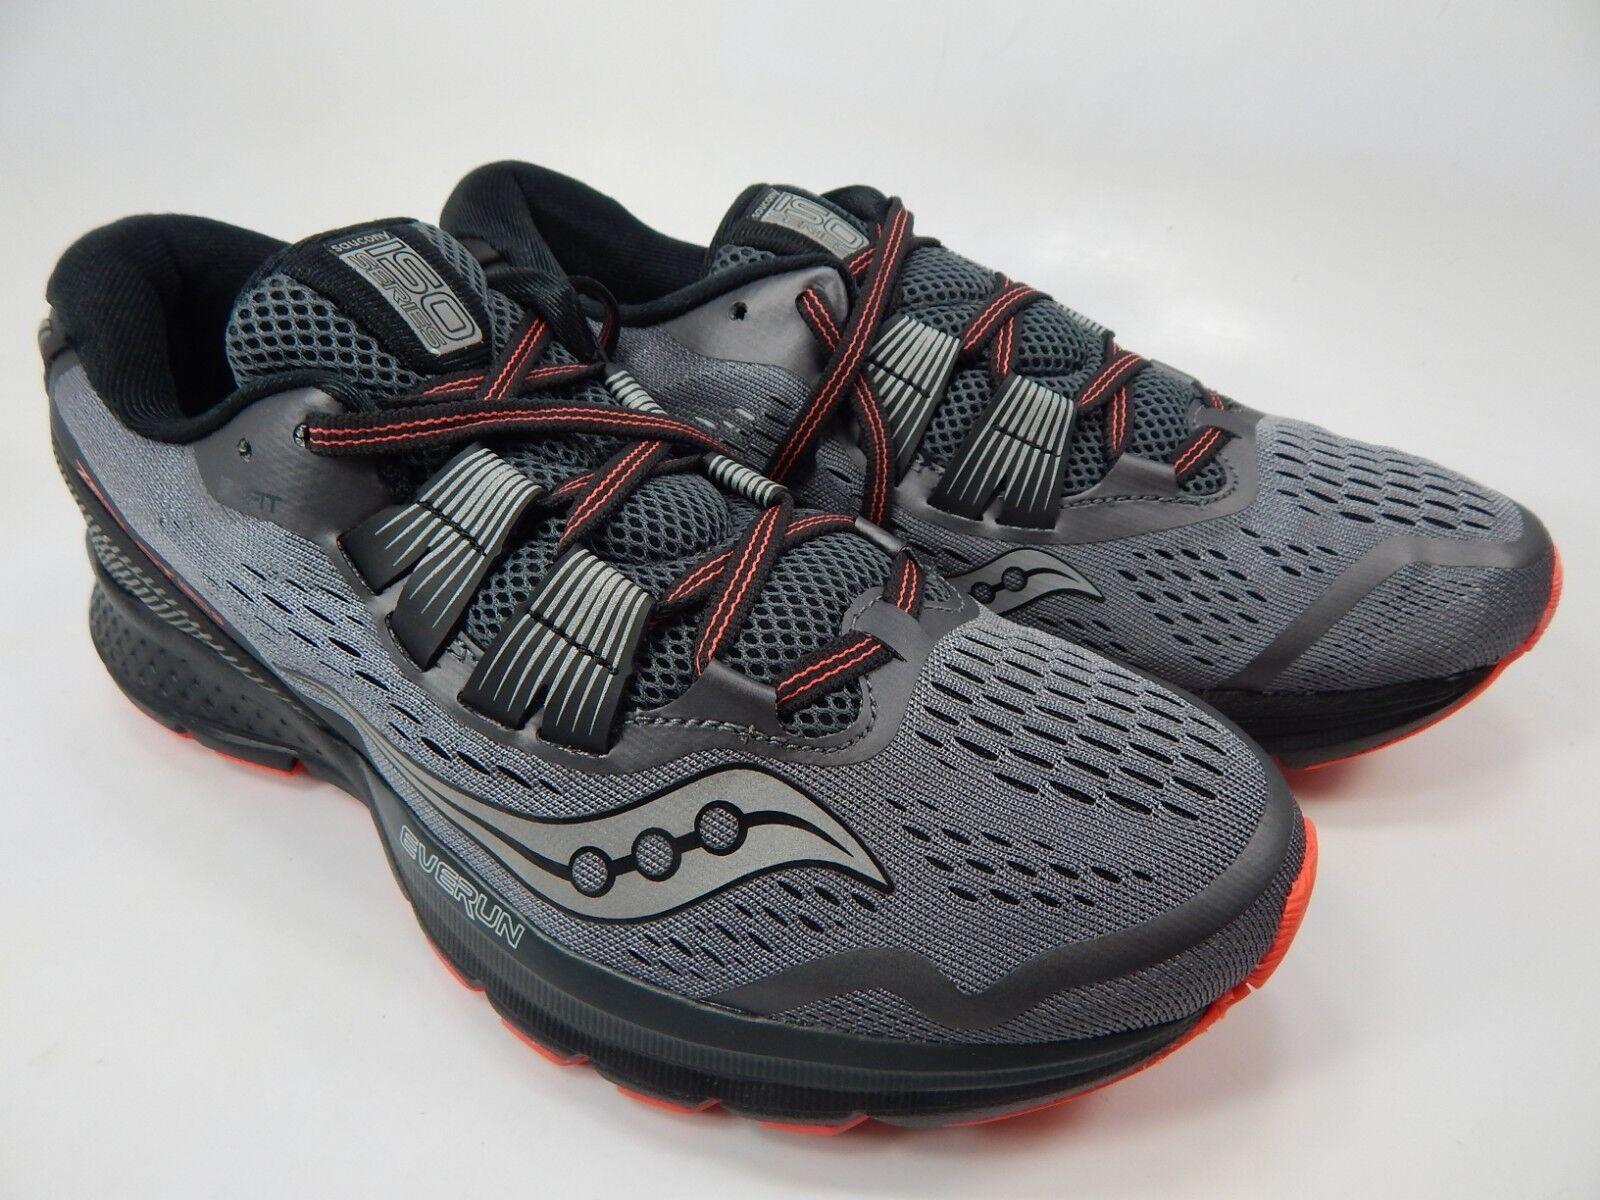 Saucony Zealot ISO 3 Size 8 M (B) EU 39 Women's Running shoes Grey S10399-1